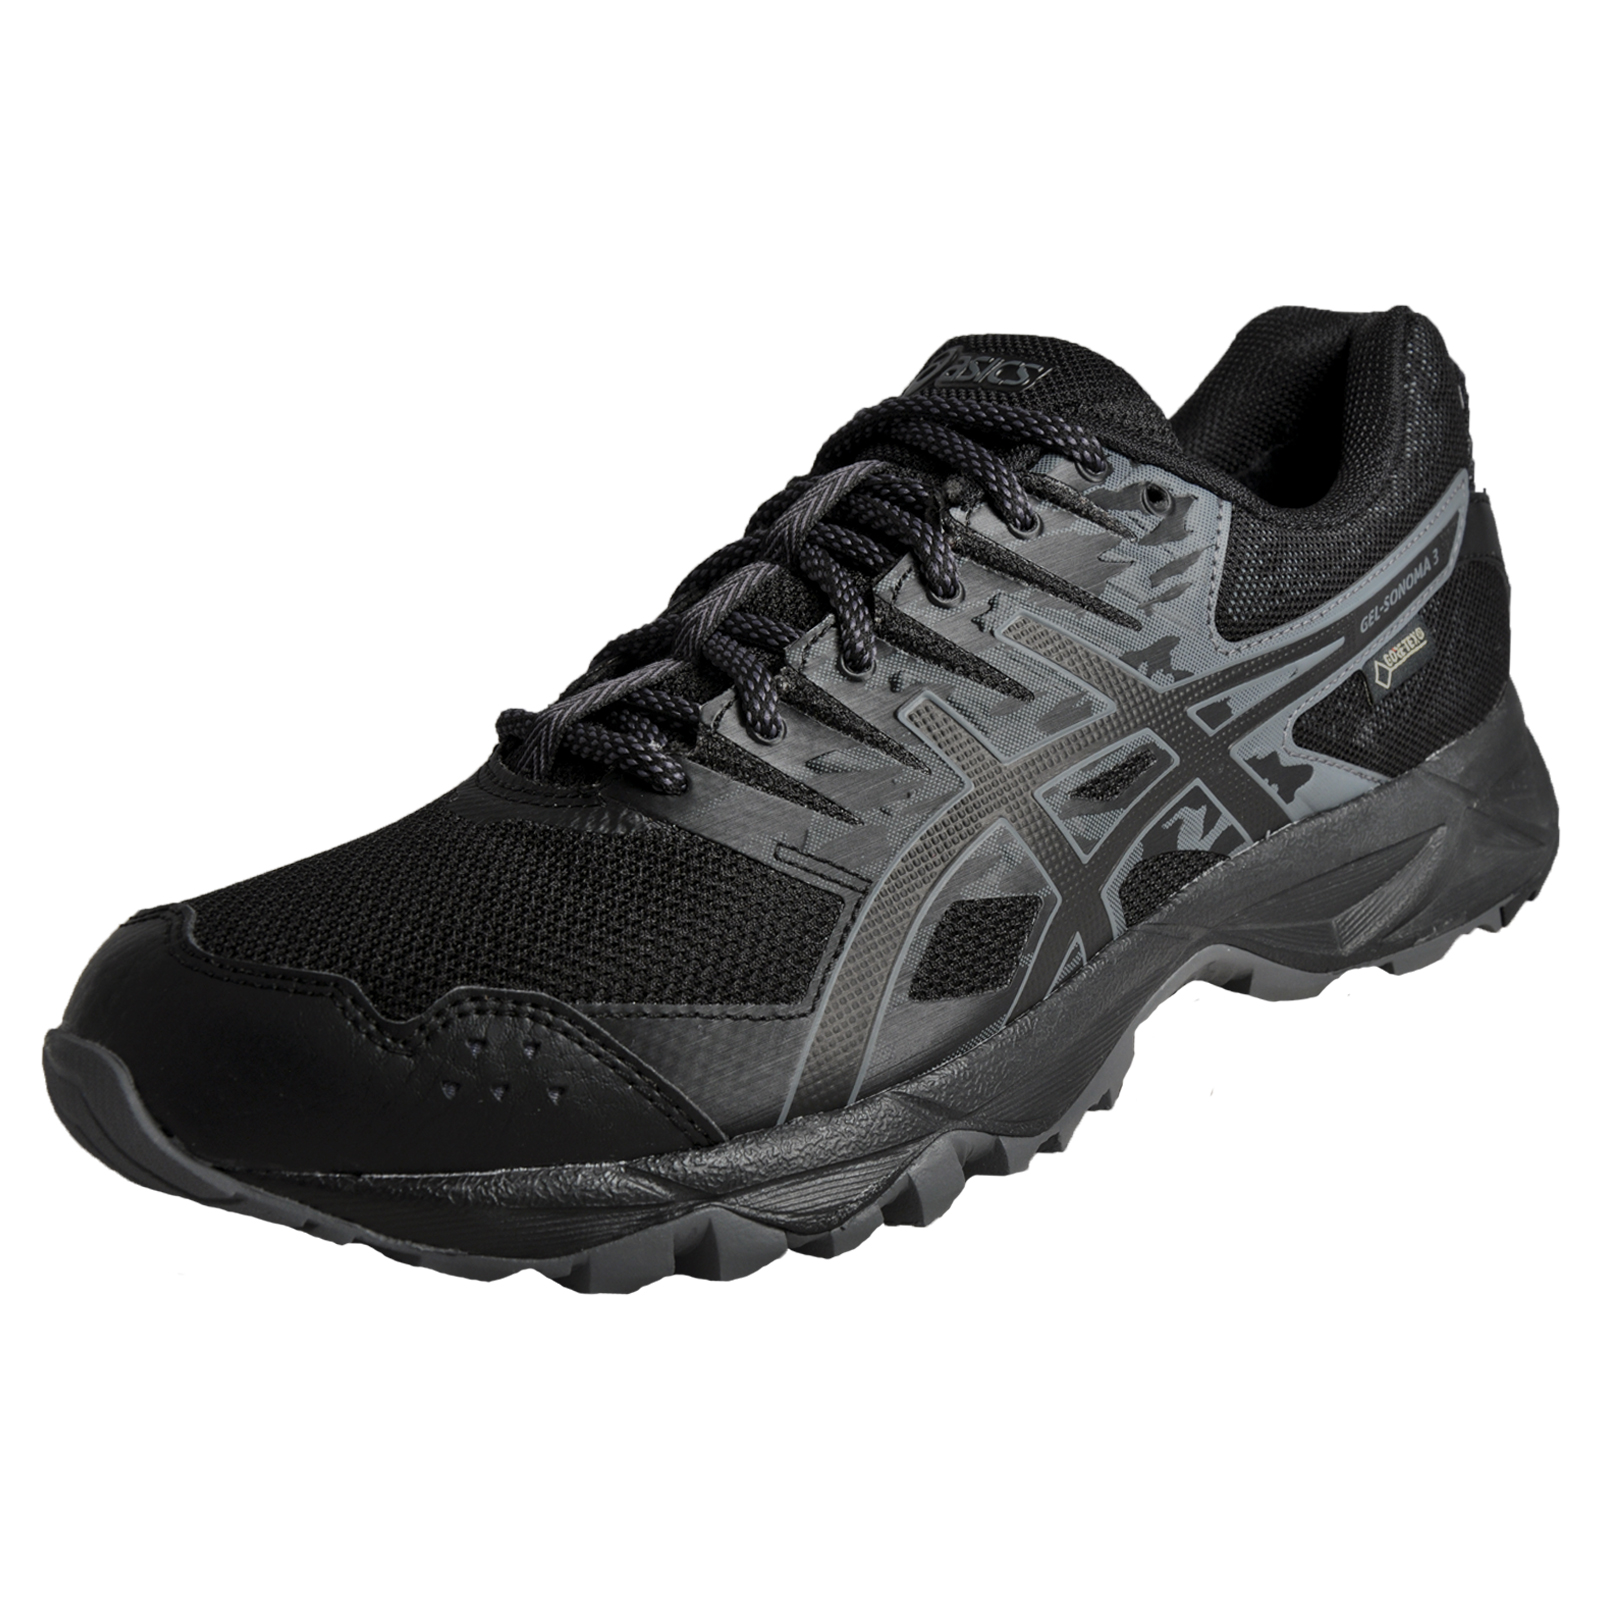 4e6676ea4bac Details about Asics Gel Sonoma 3 GTX Gore Tex Mens All Terrain Outdoor Trail  Running Shoes Bla